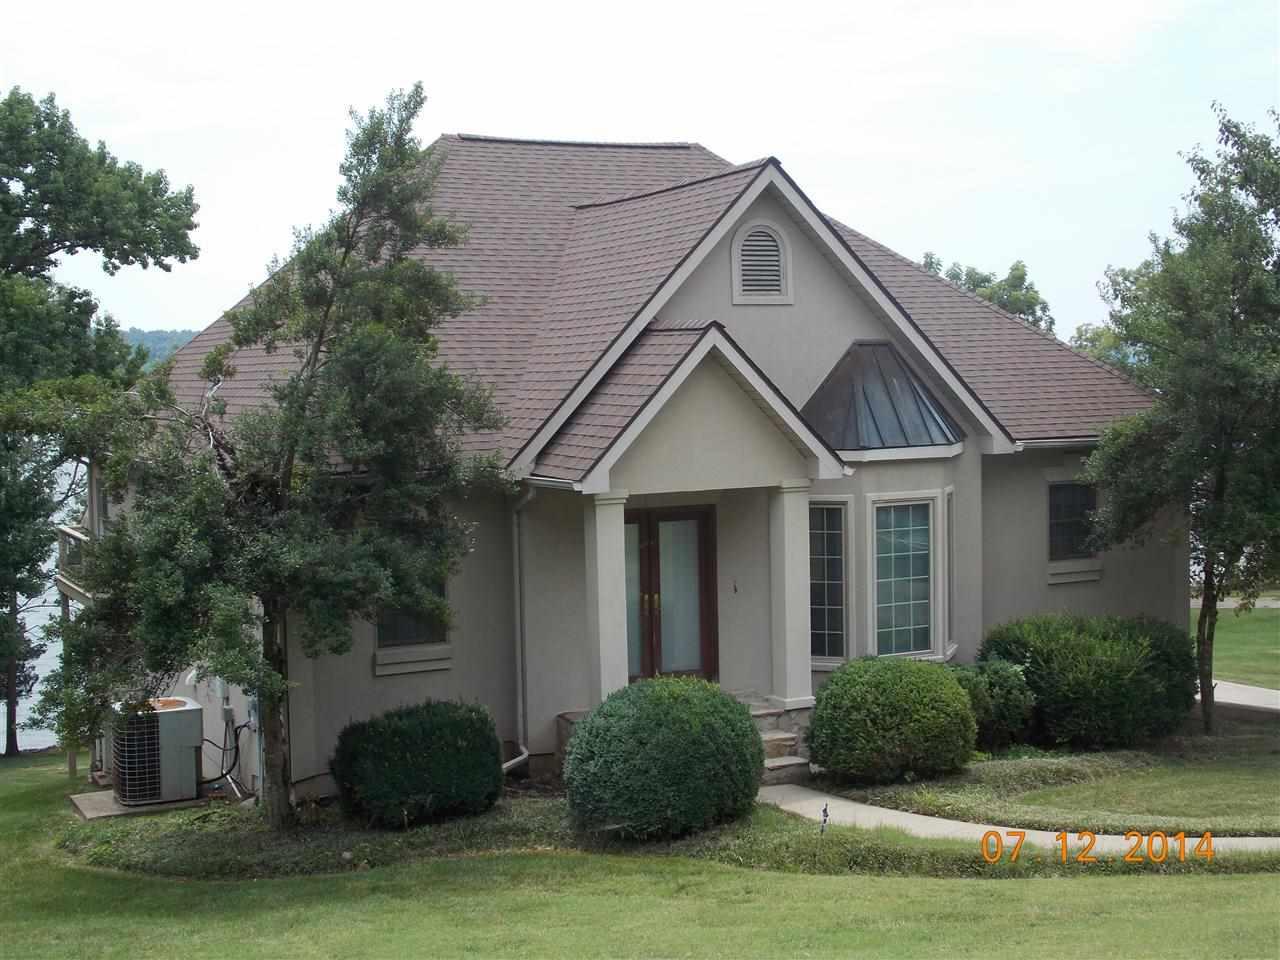 Real Estate for Sale, ListingId: 29090380, Eddyville,KY42038